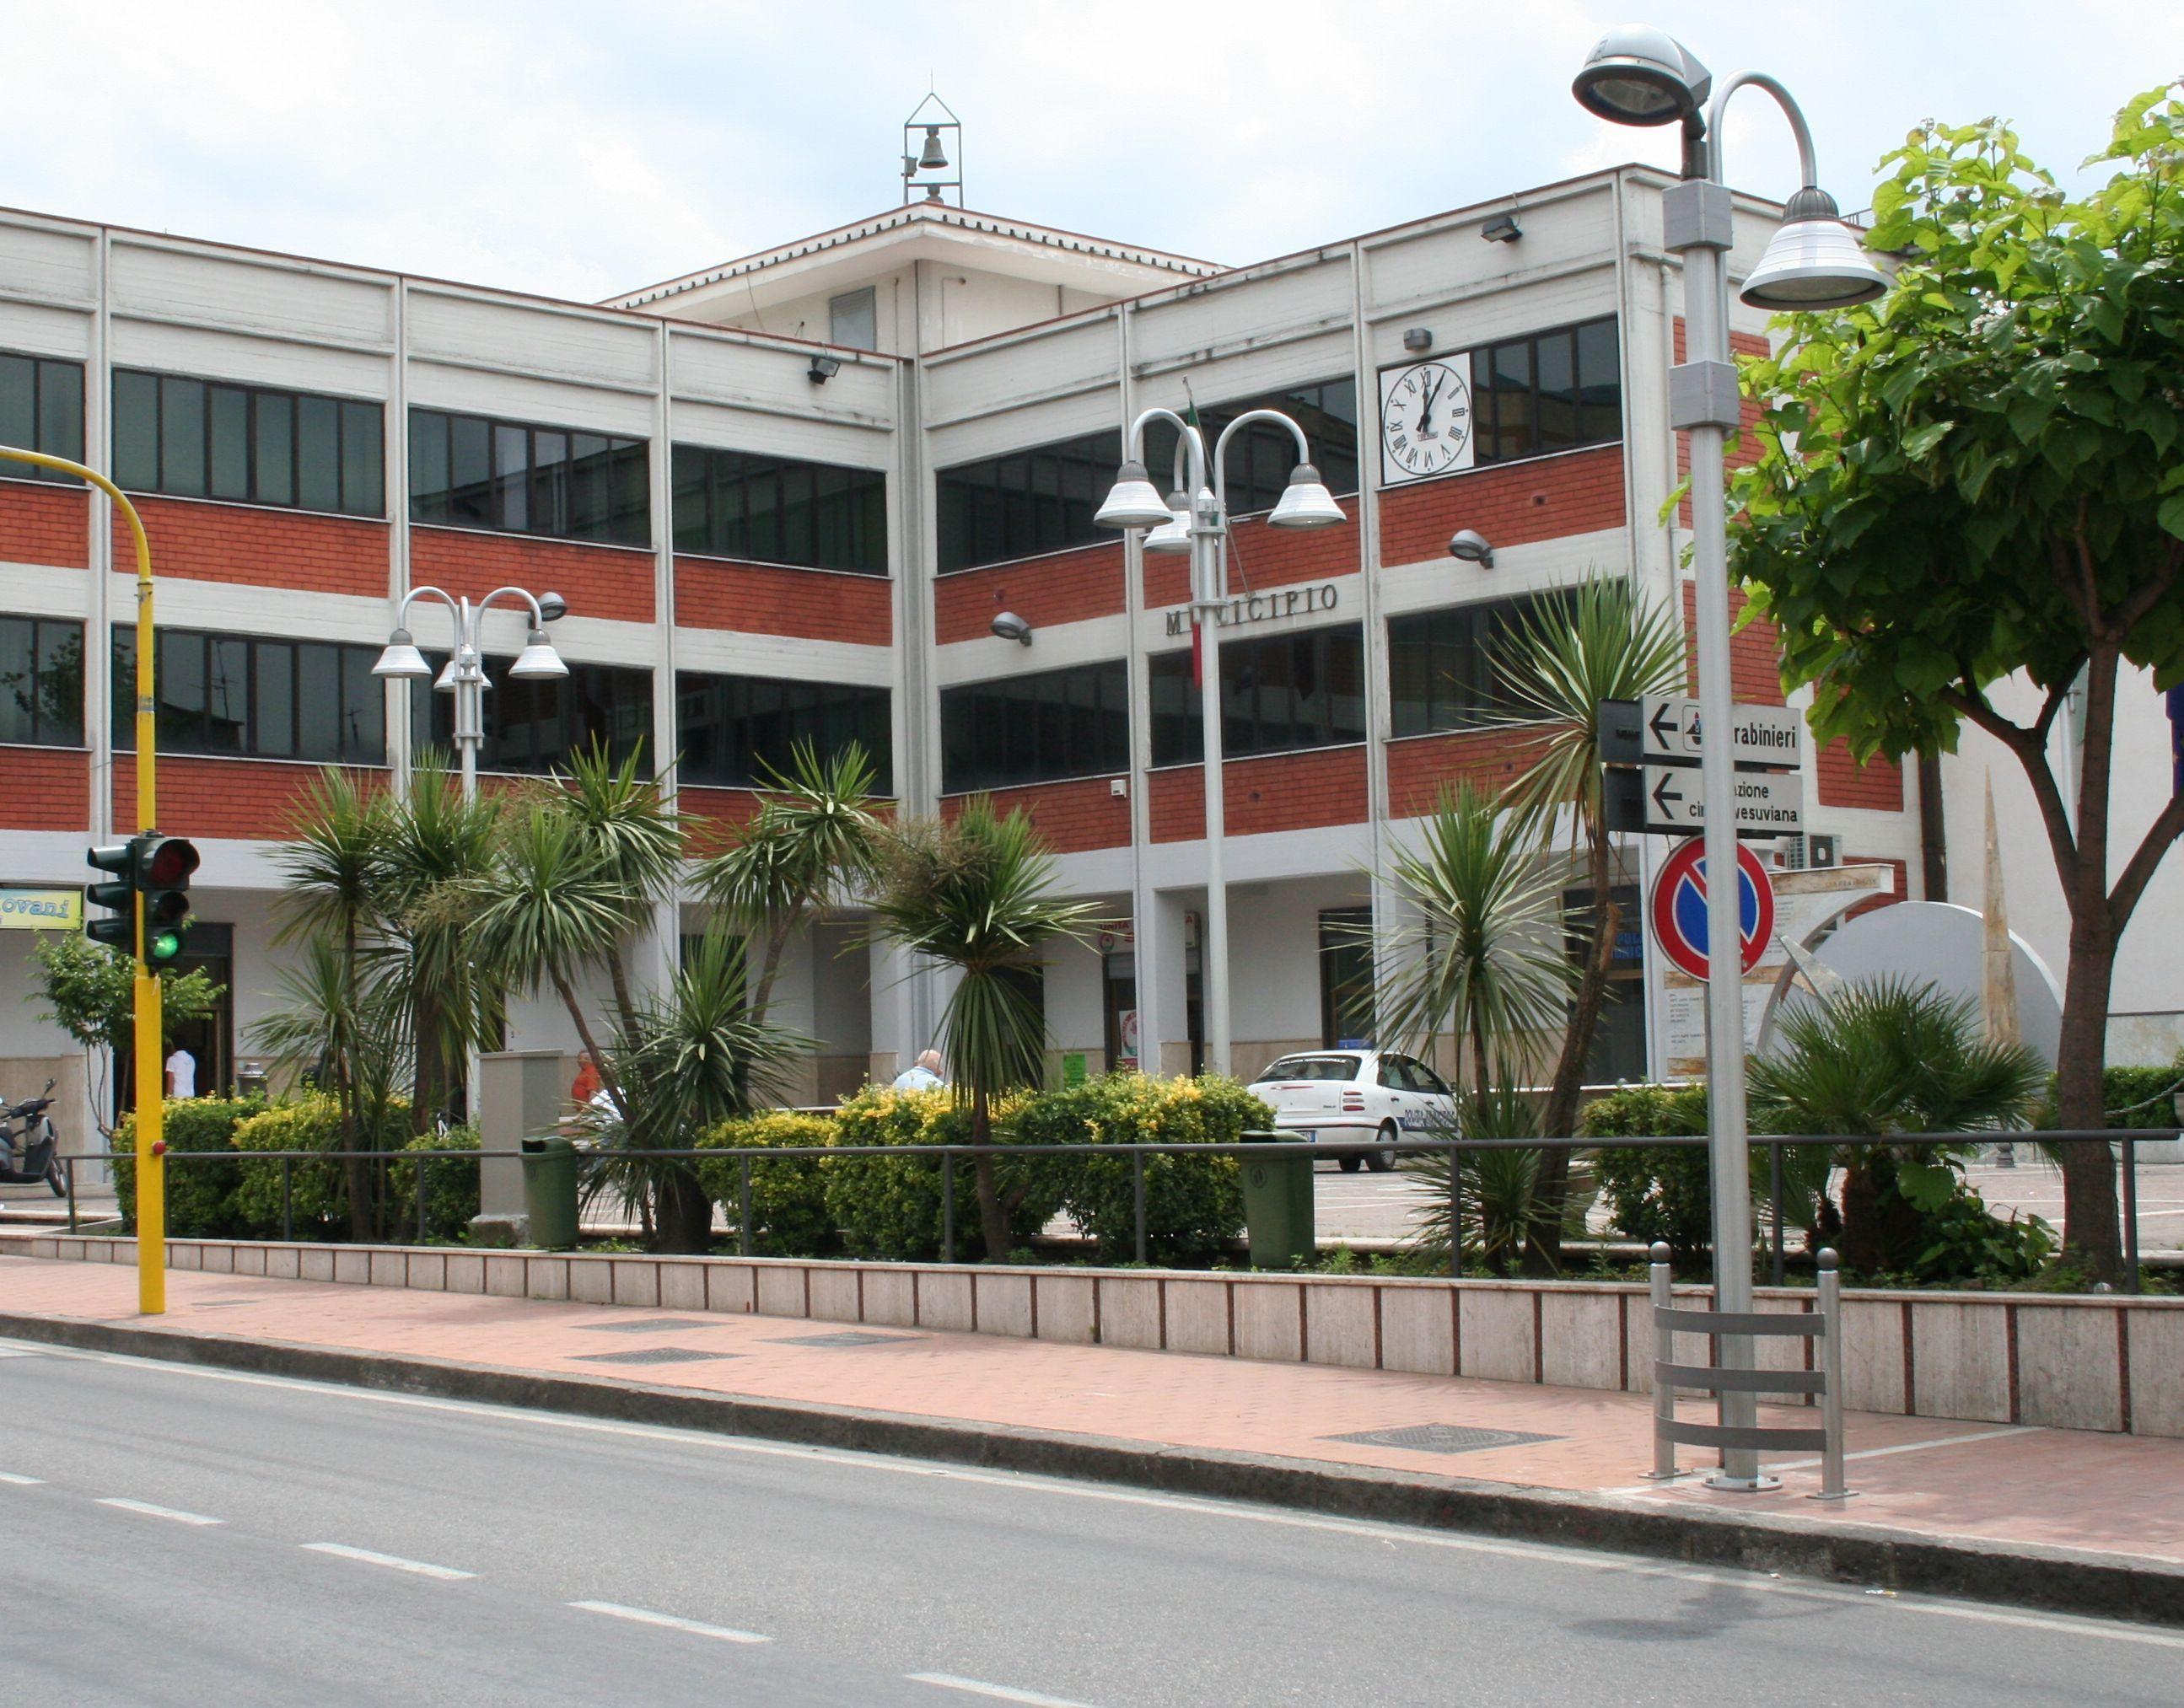 municipio sperone